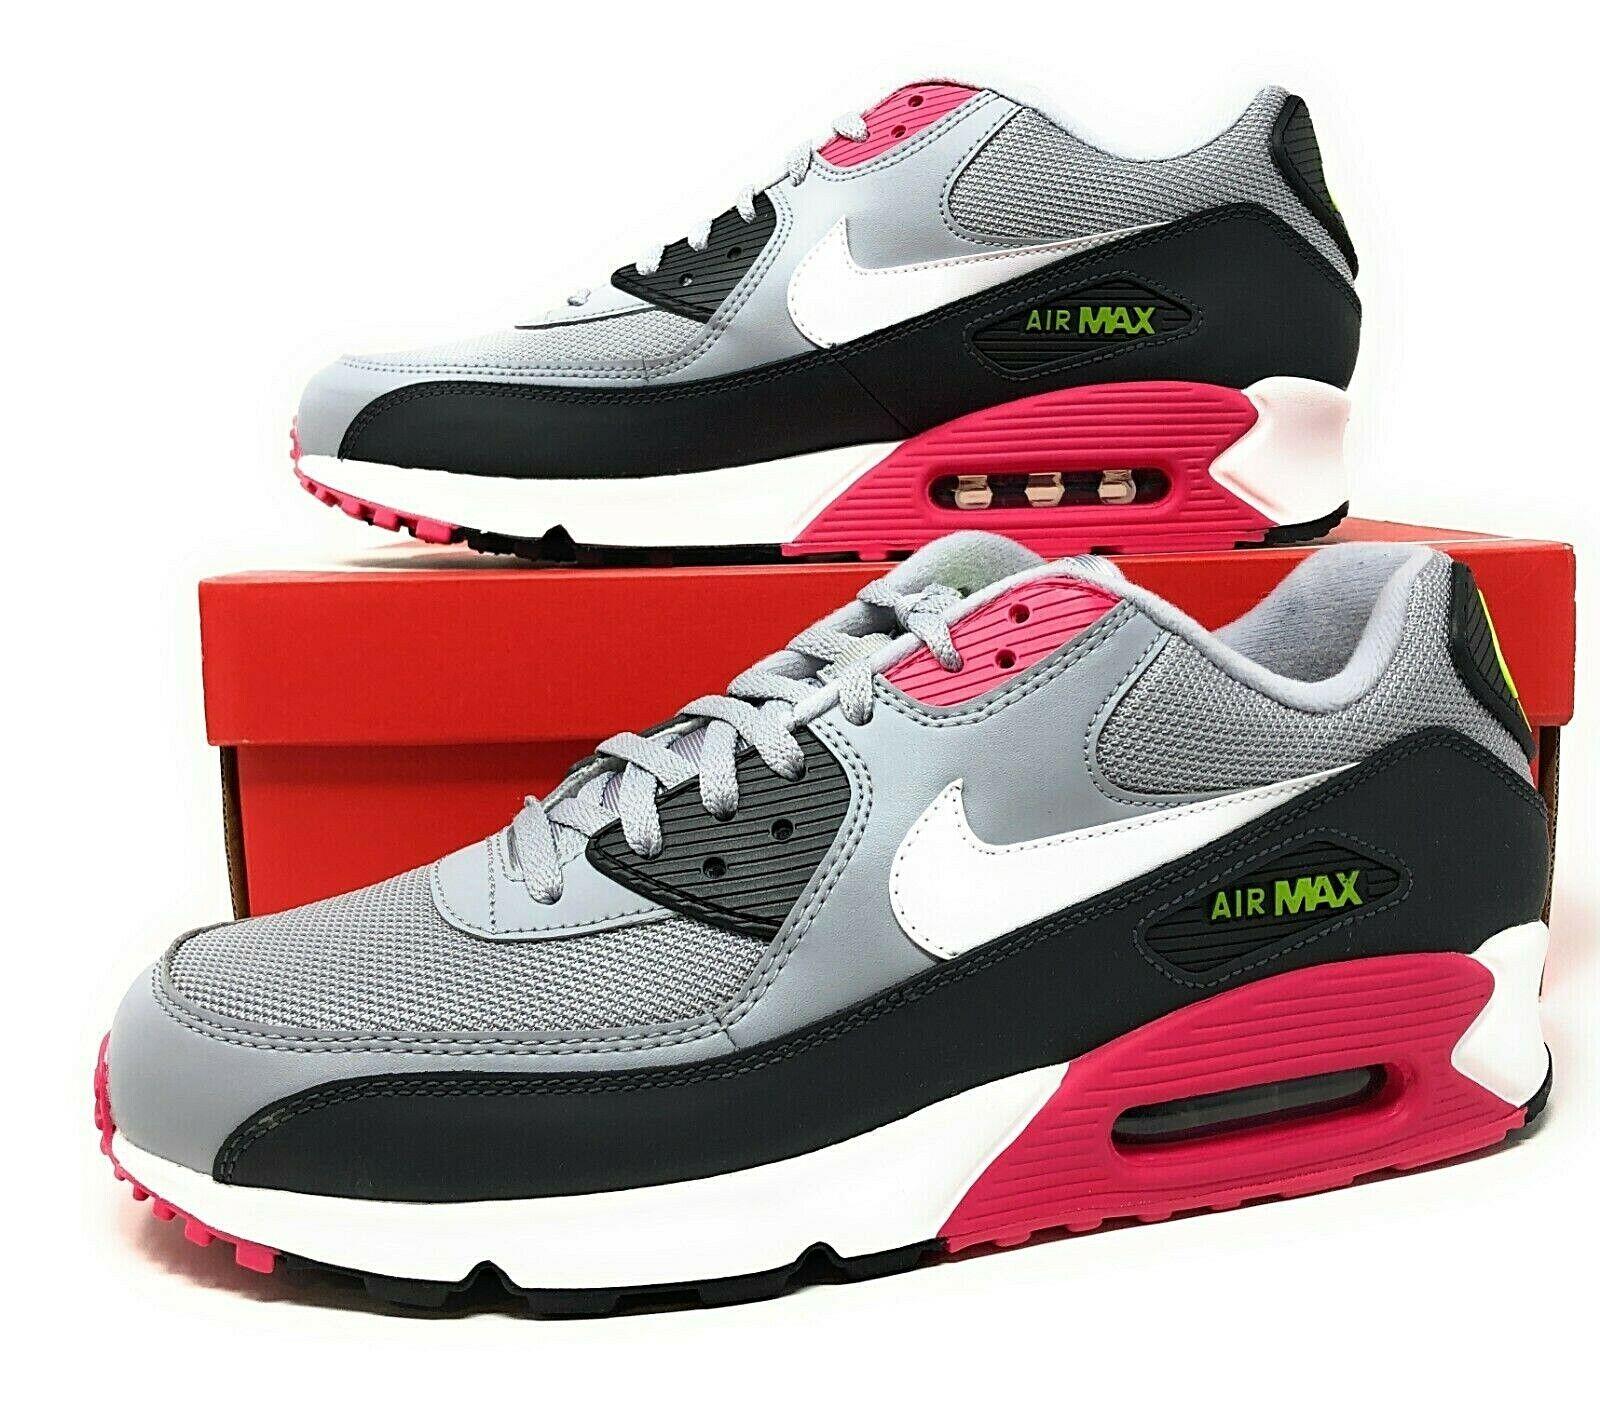 Nike Air Max Thea Damen Türkis Pink schuetzt unsere